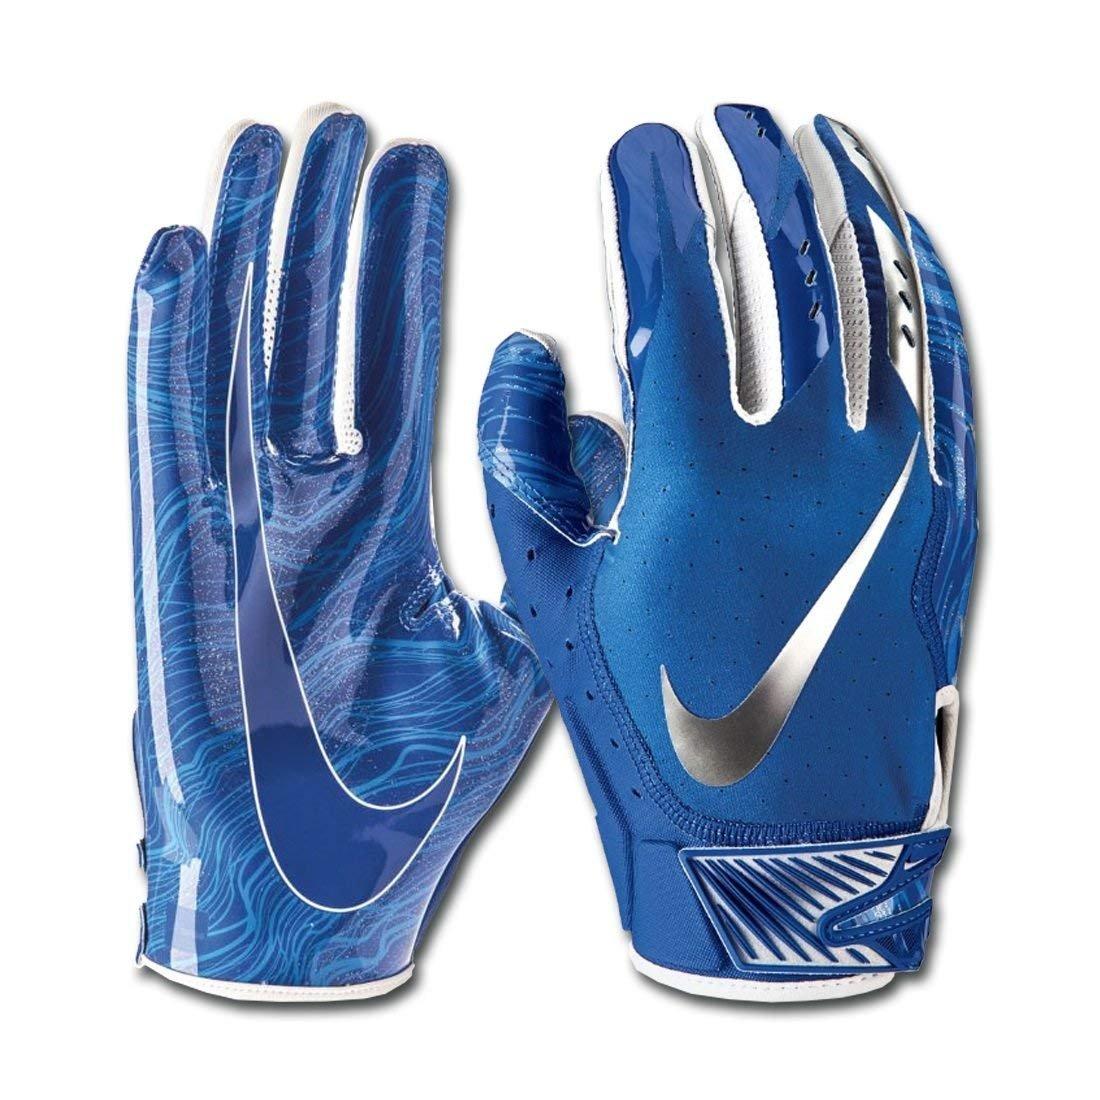 Men's Nike Vapor Jet 5.0 Football Gloves Game Royal/Chrome Size Large